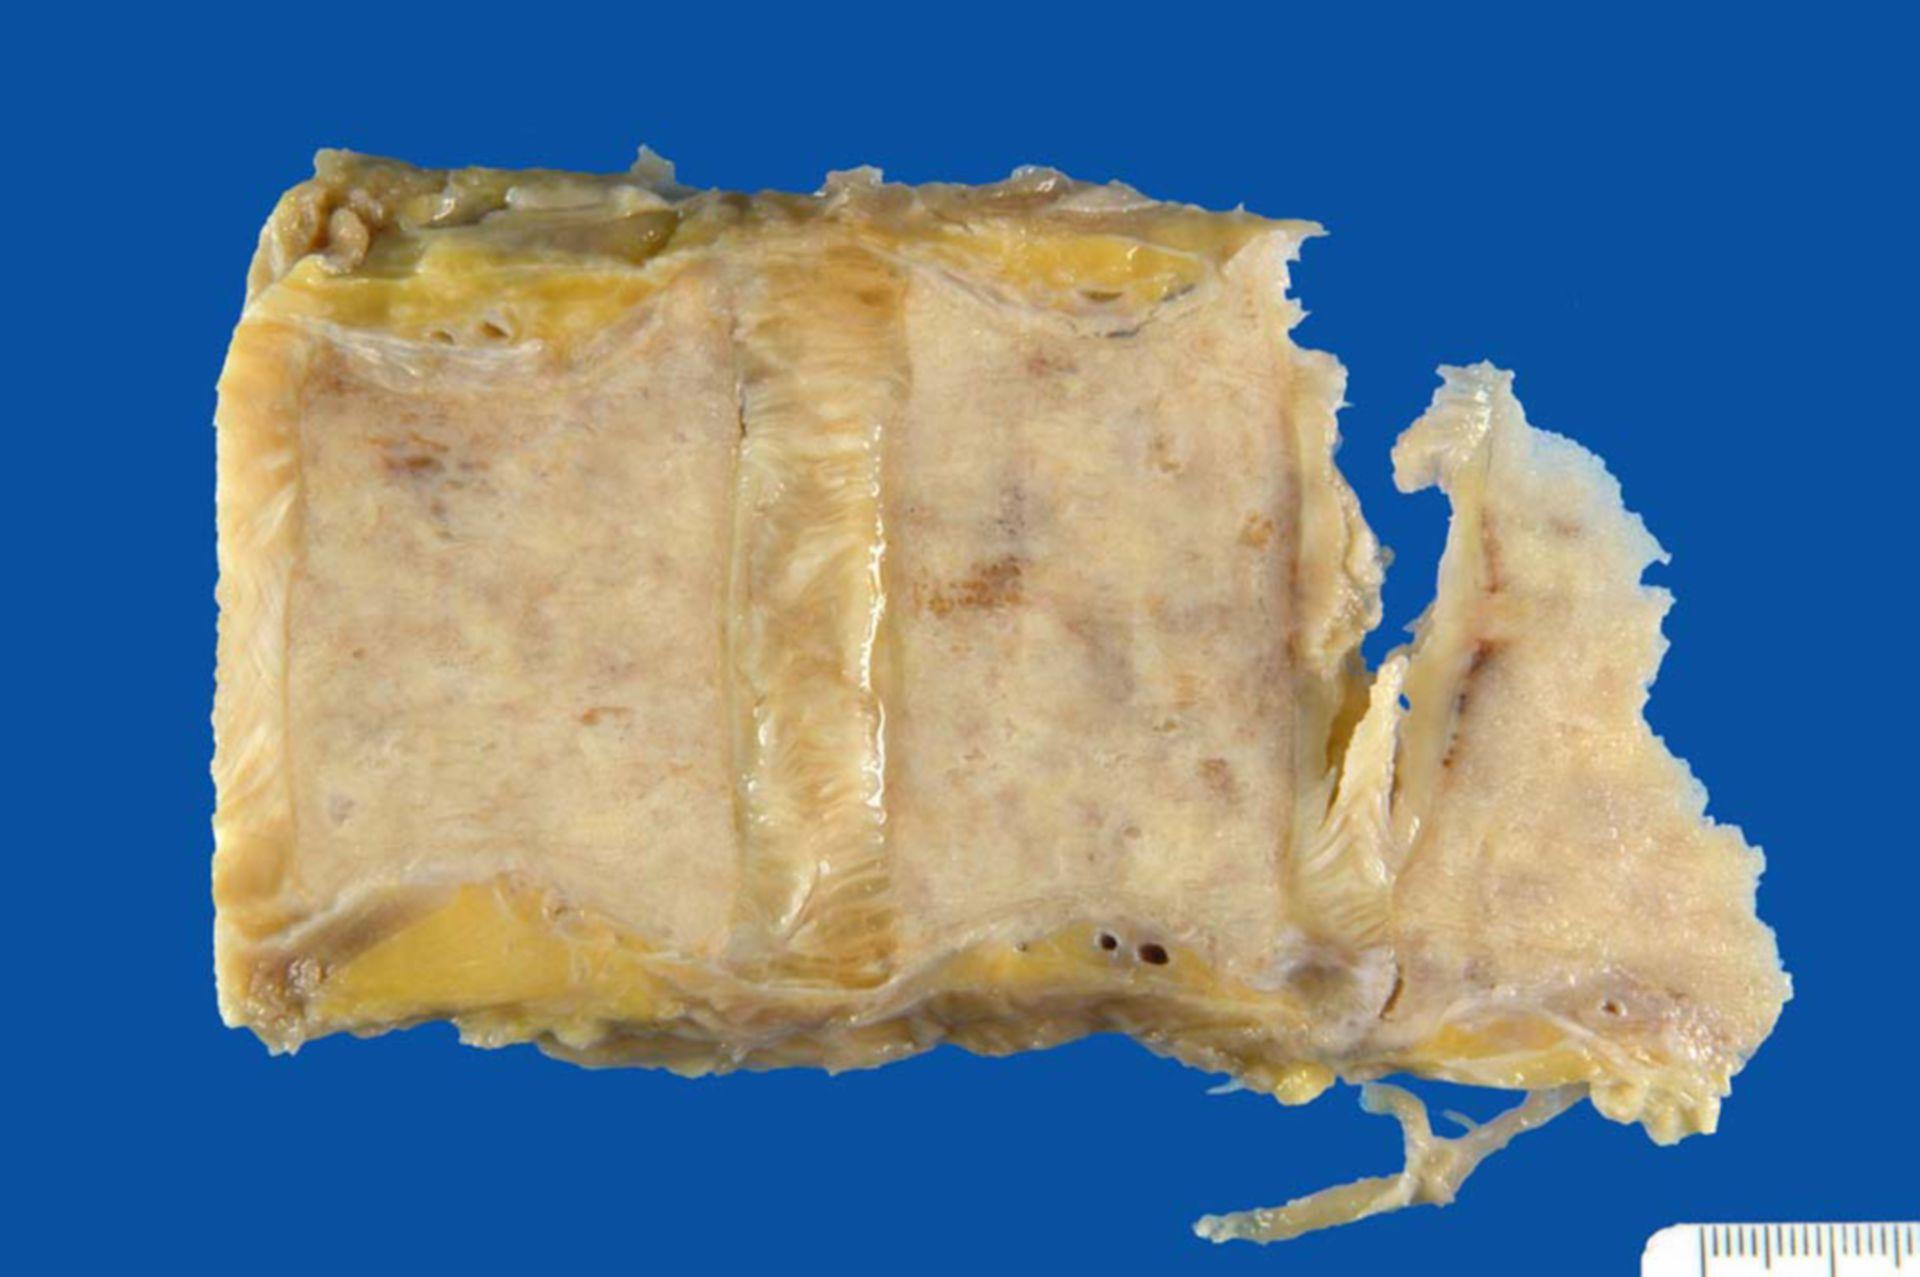 Prostatakarzinom: Osteoblastische Knochenmetastasen